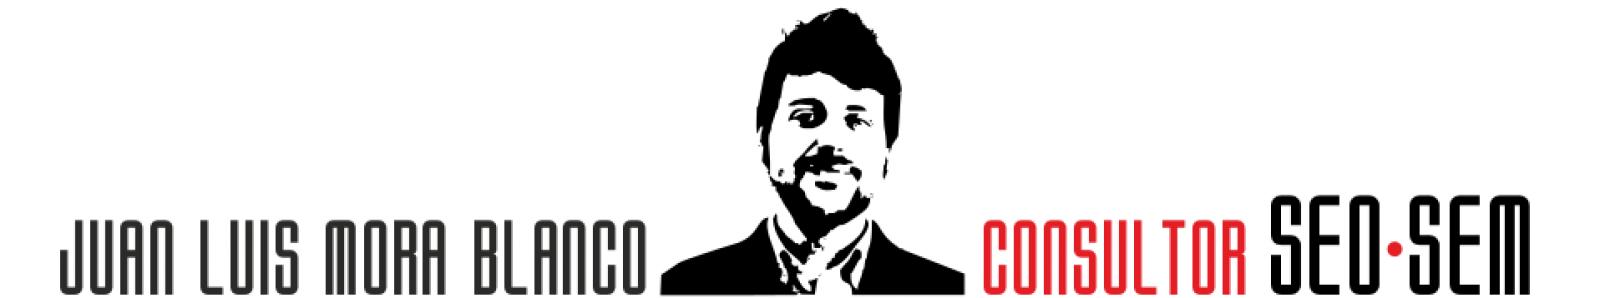 Juan Luis Mora Consultor SEO y SEM Freelance